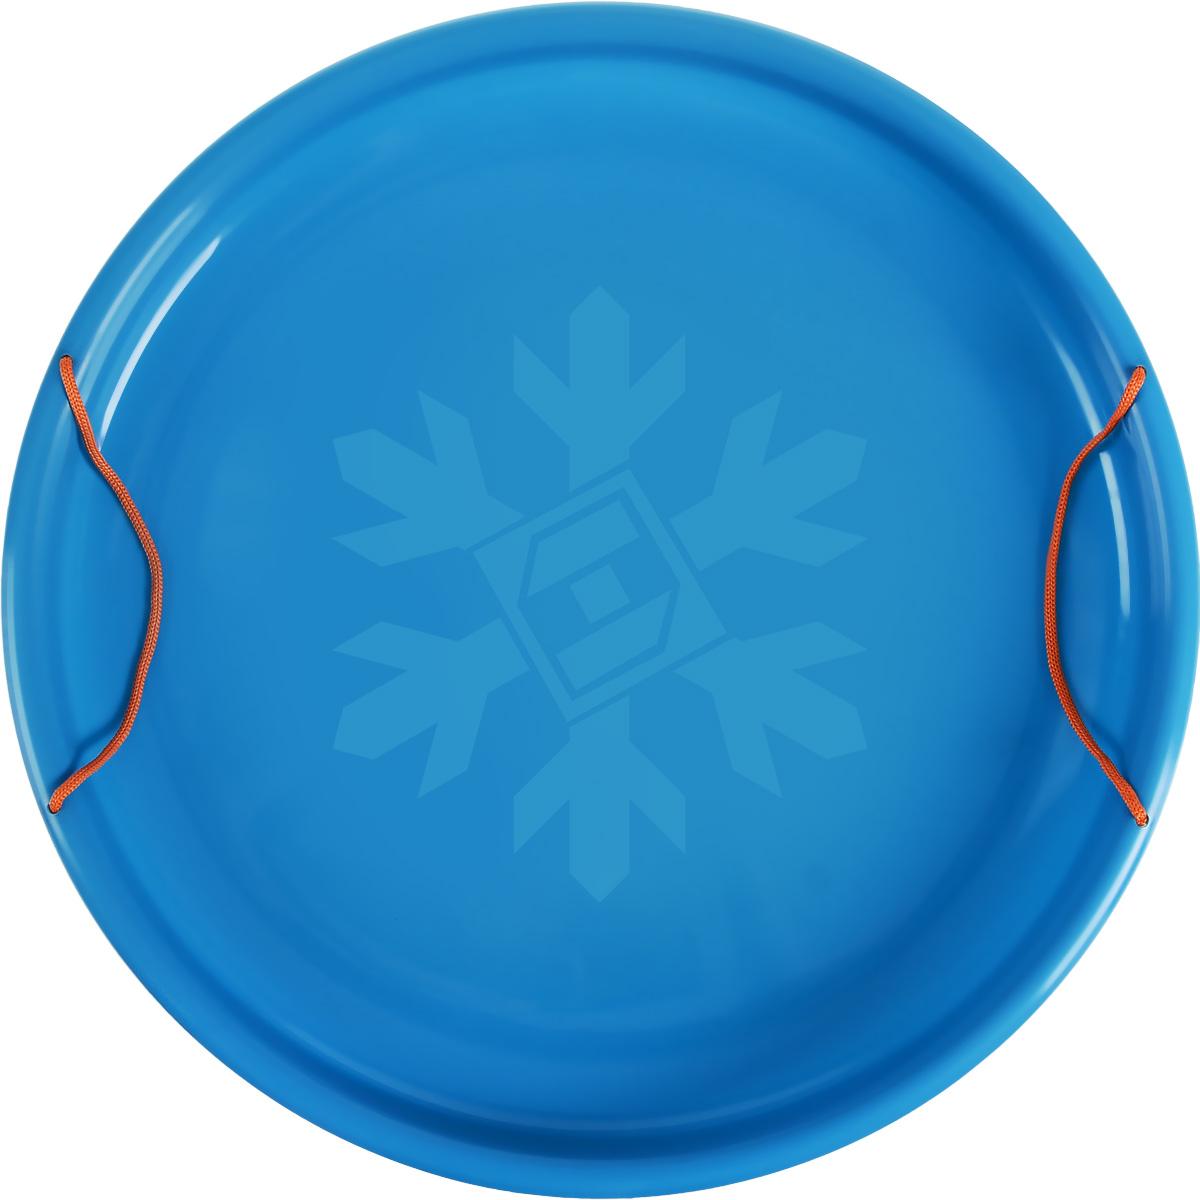 "Фото Санки-ледянки Престиж ""Экстрим"", цвет: голубой, диаметр 53 см. Купить  в РФ"